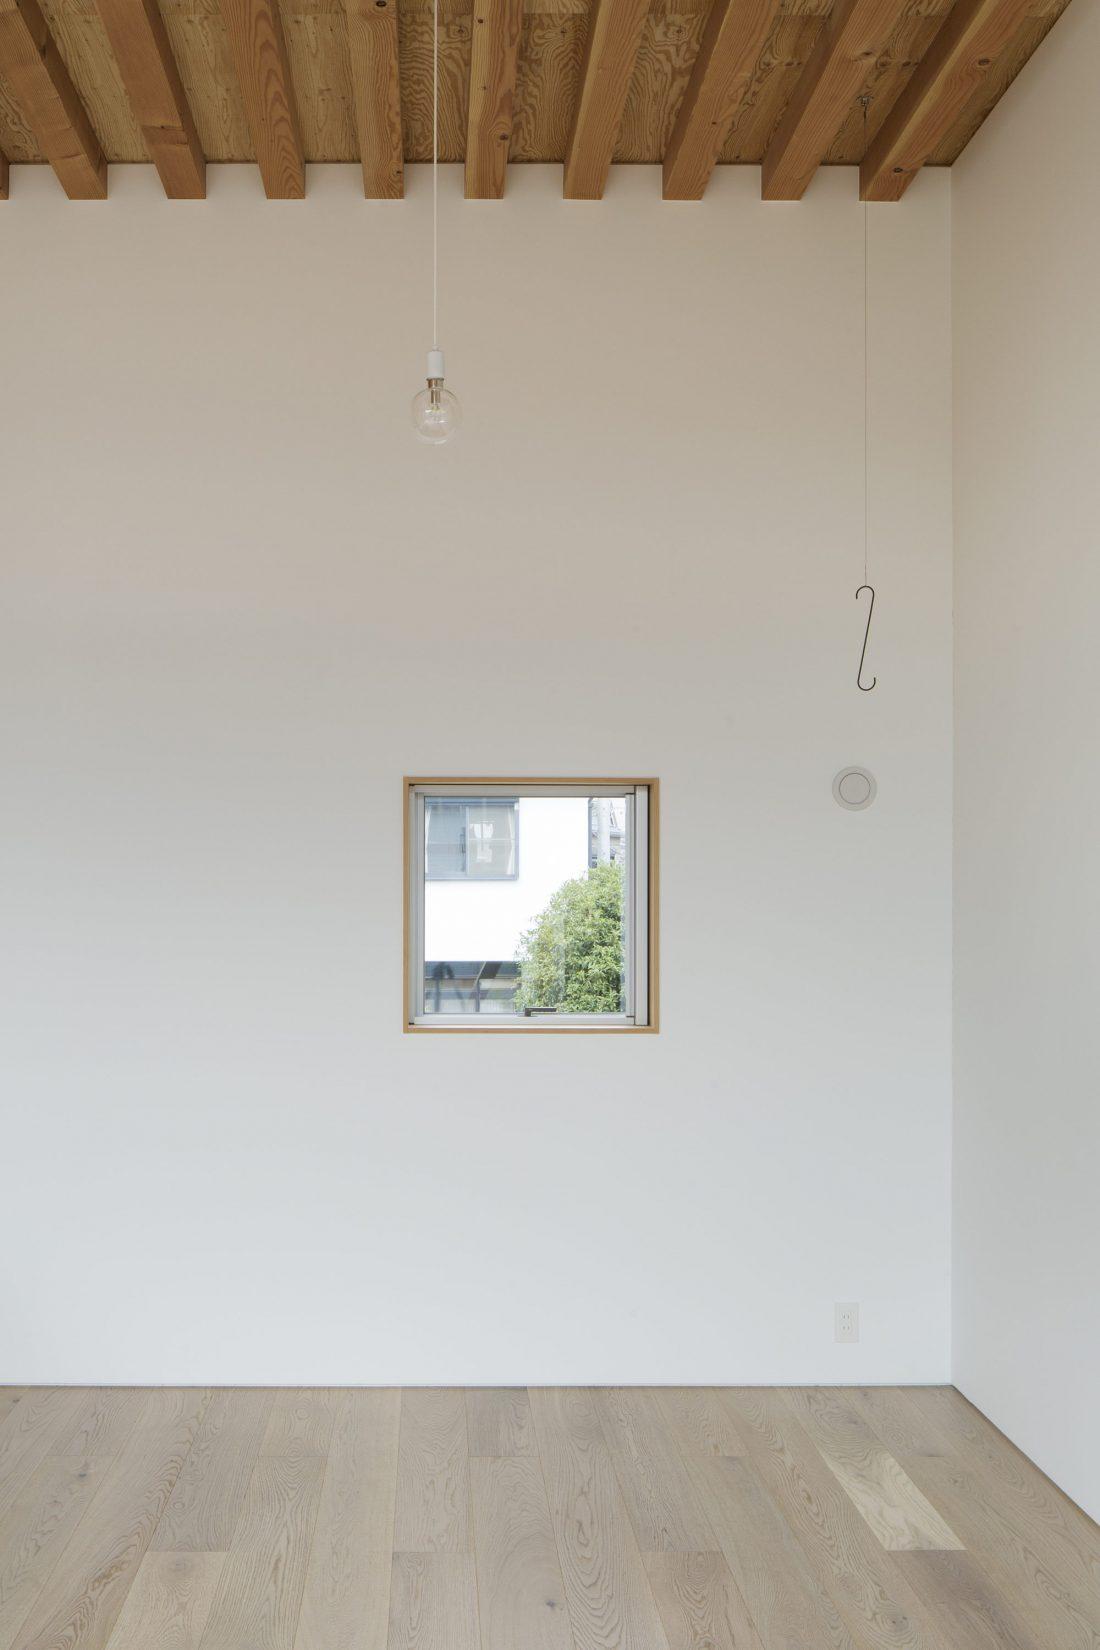 Дом в Токио по системе Shakkanho по проекту Tetsuo Yamaji 16